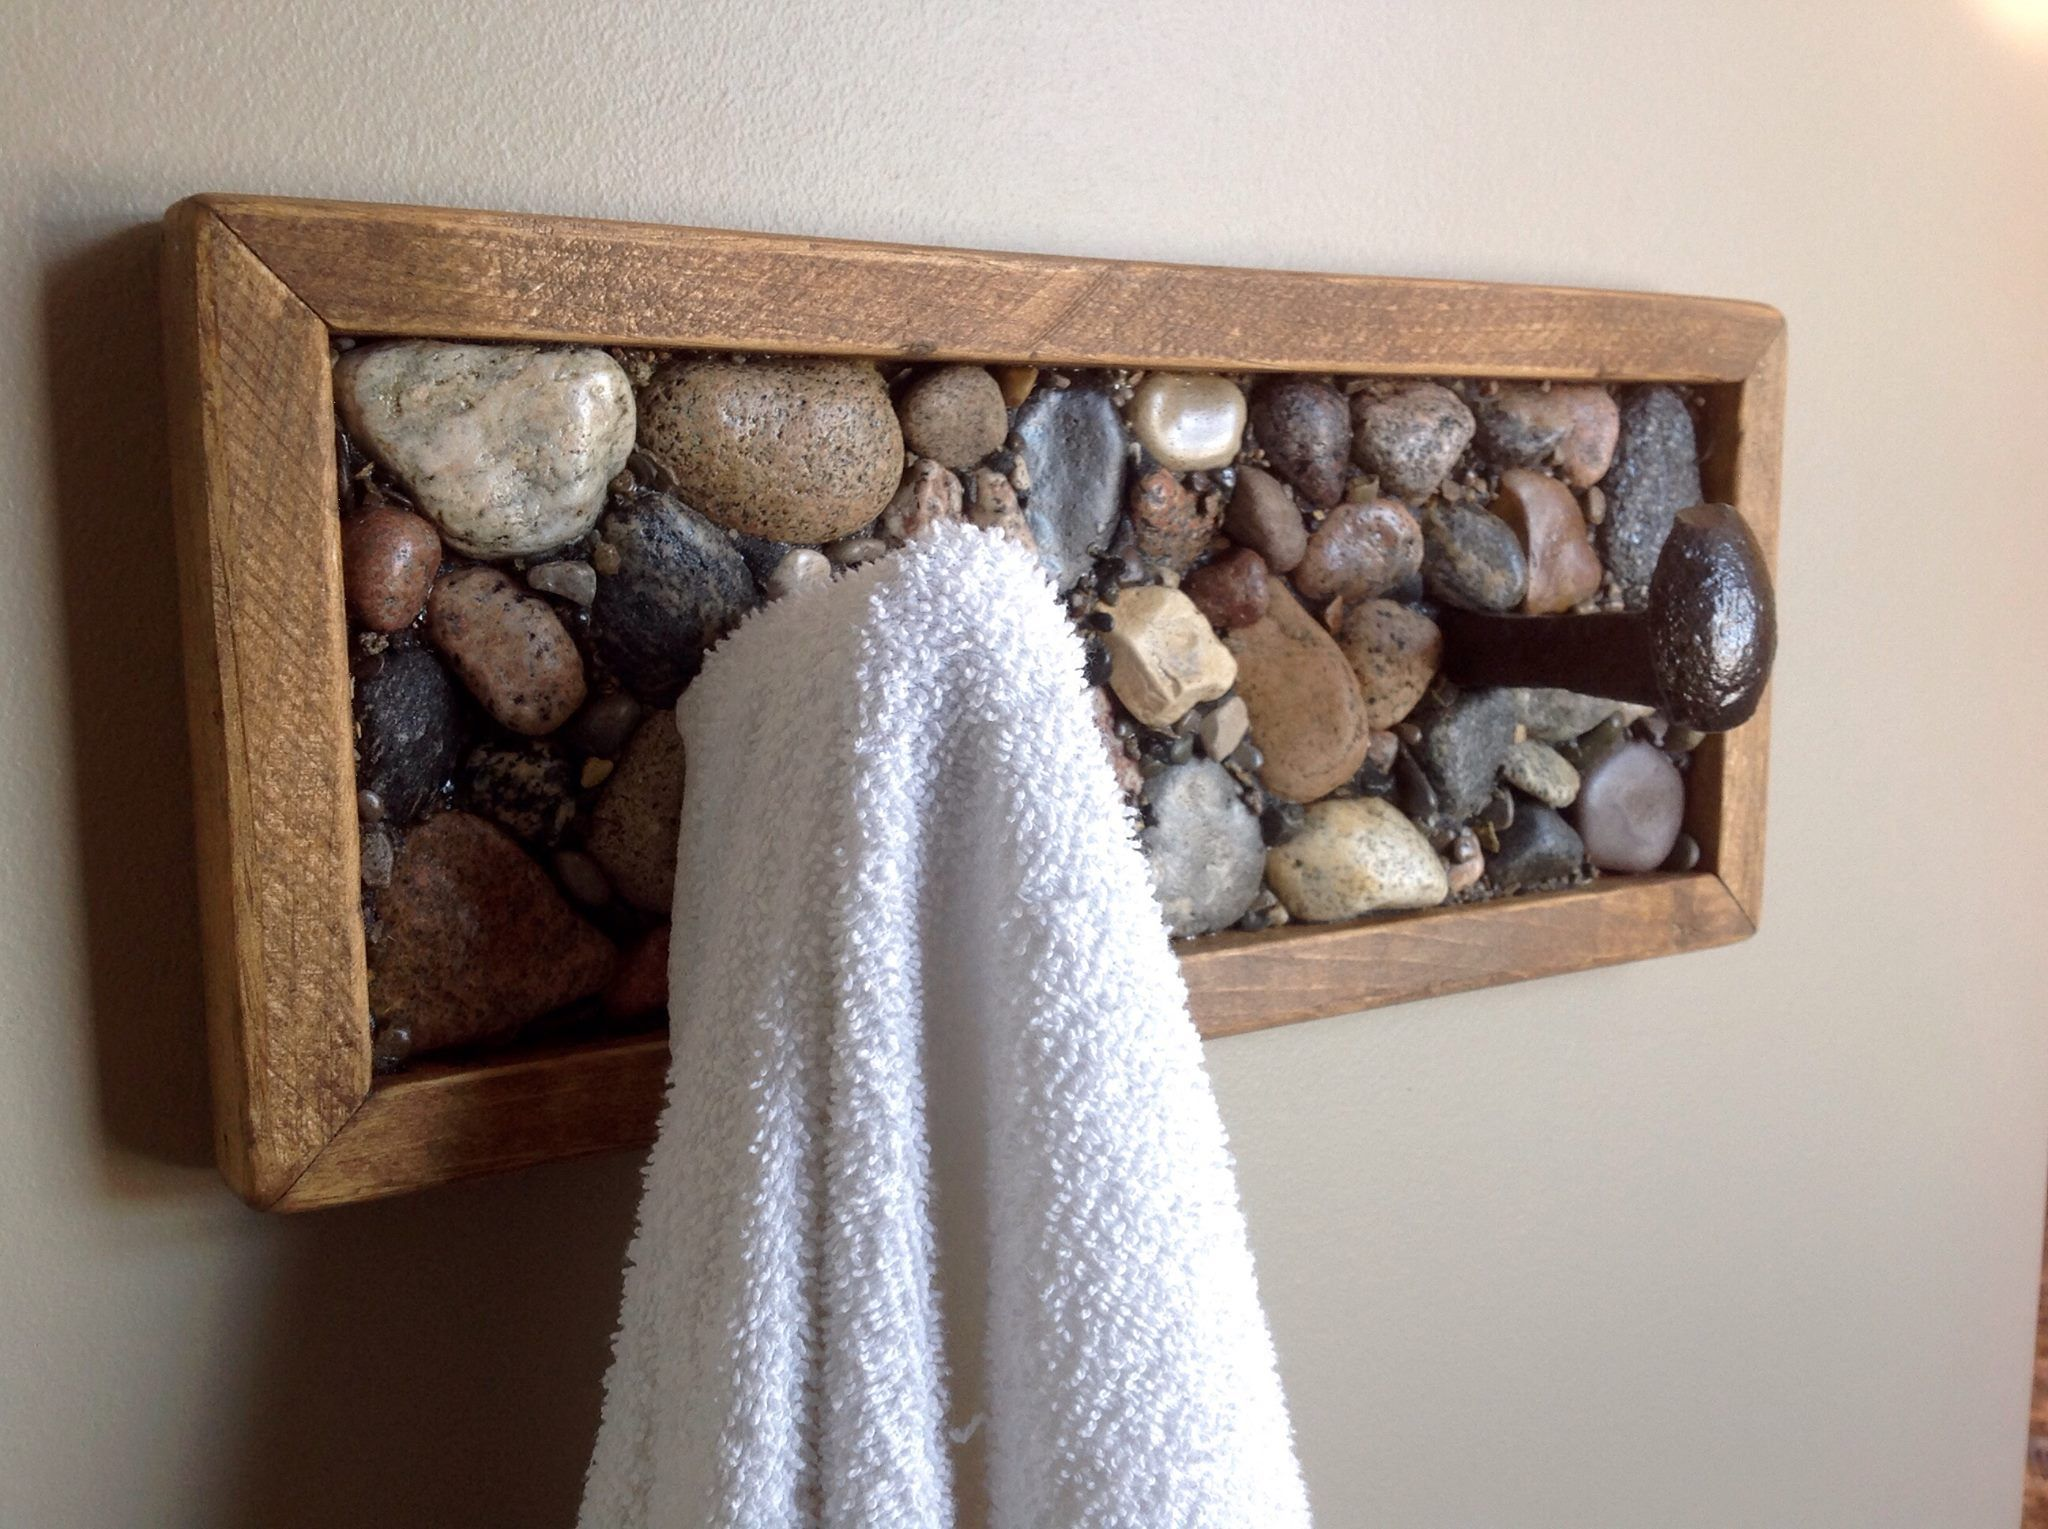 Coat Rack Or Towel Rack Made From Railway Spikes Beach